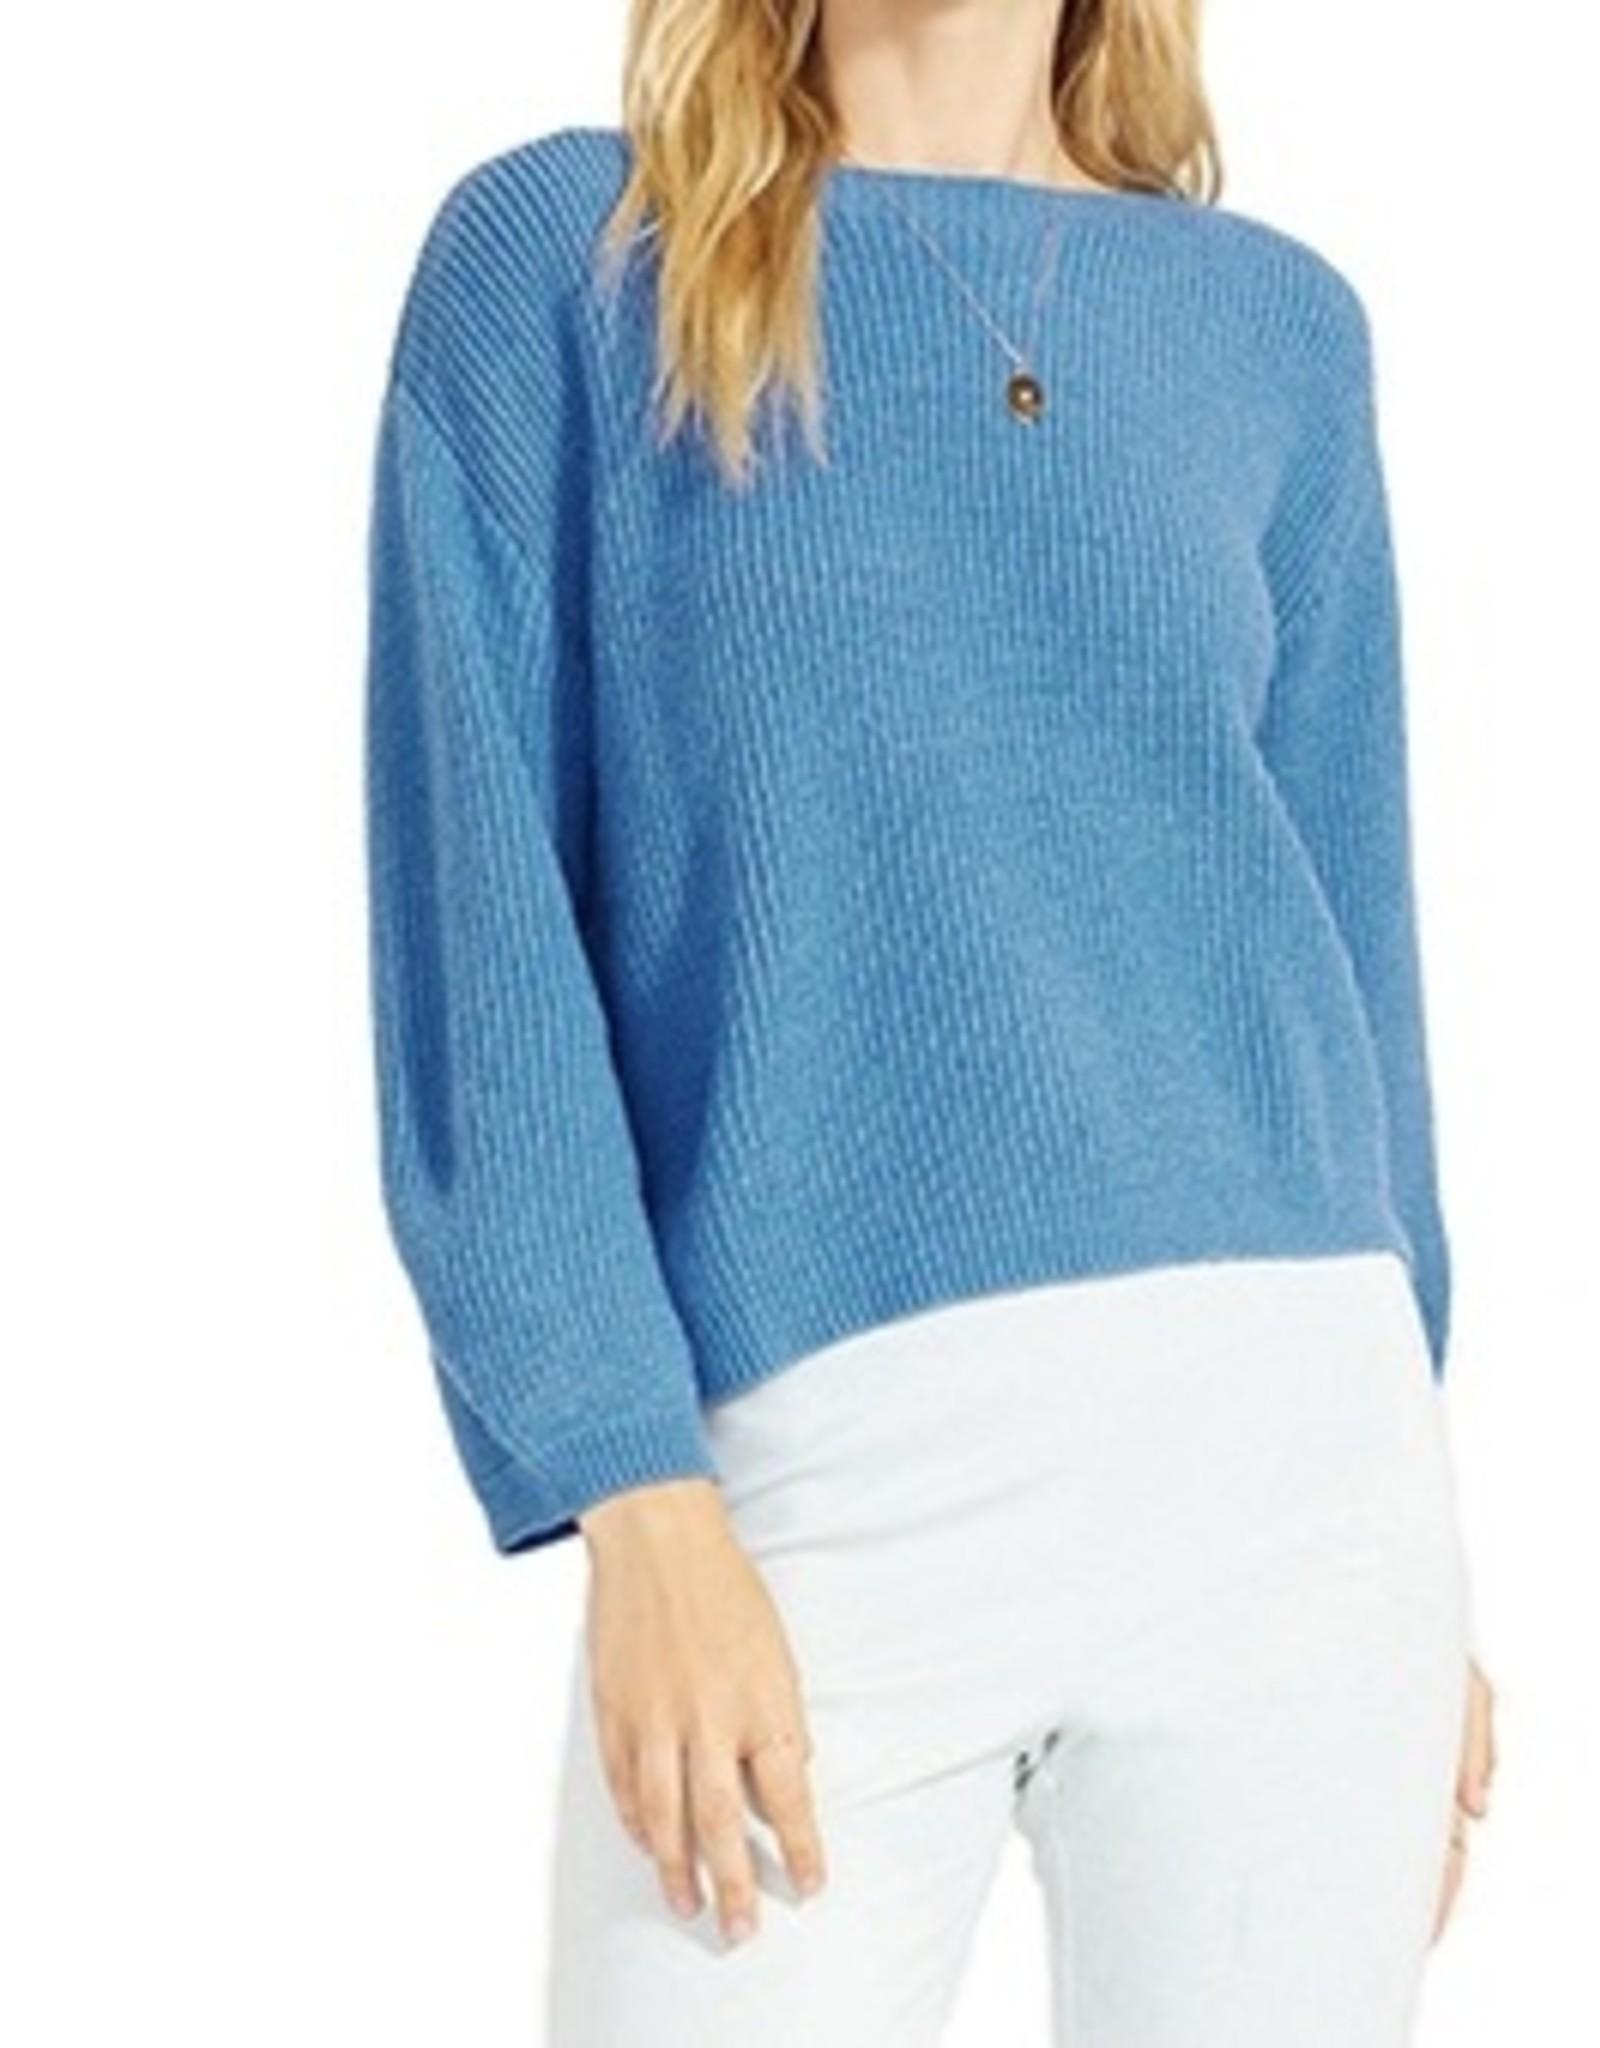 BB Dakota Fair Play Sweater